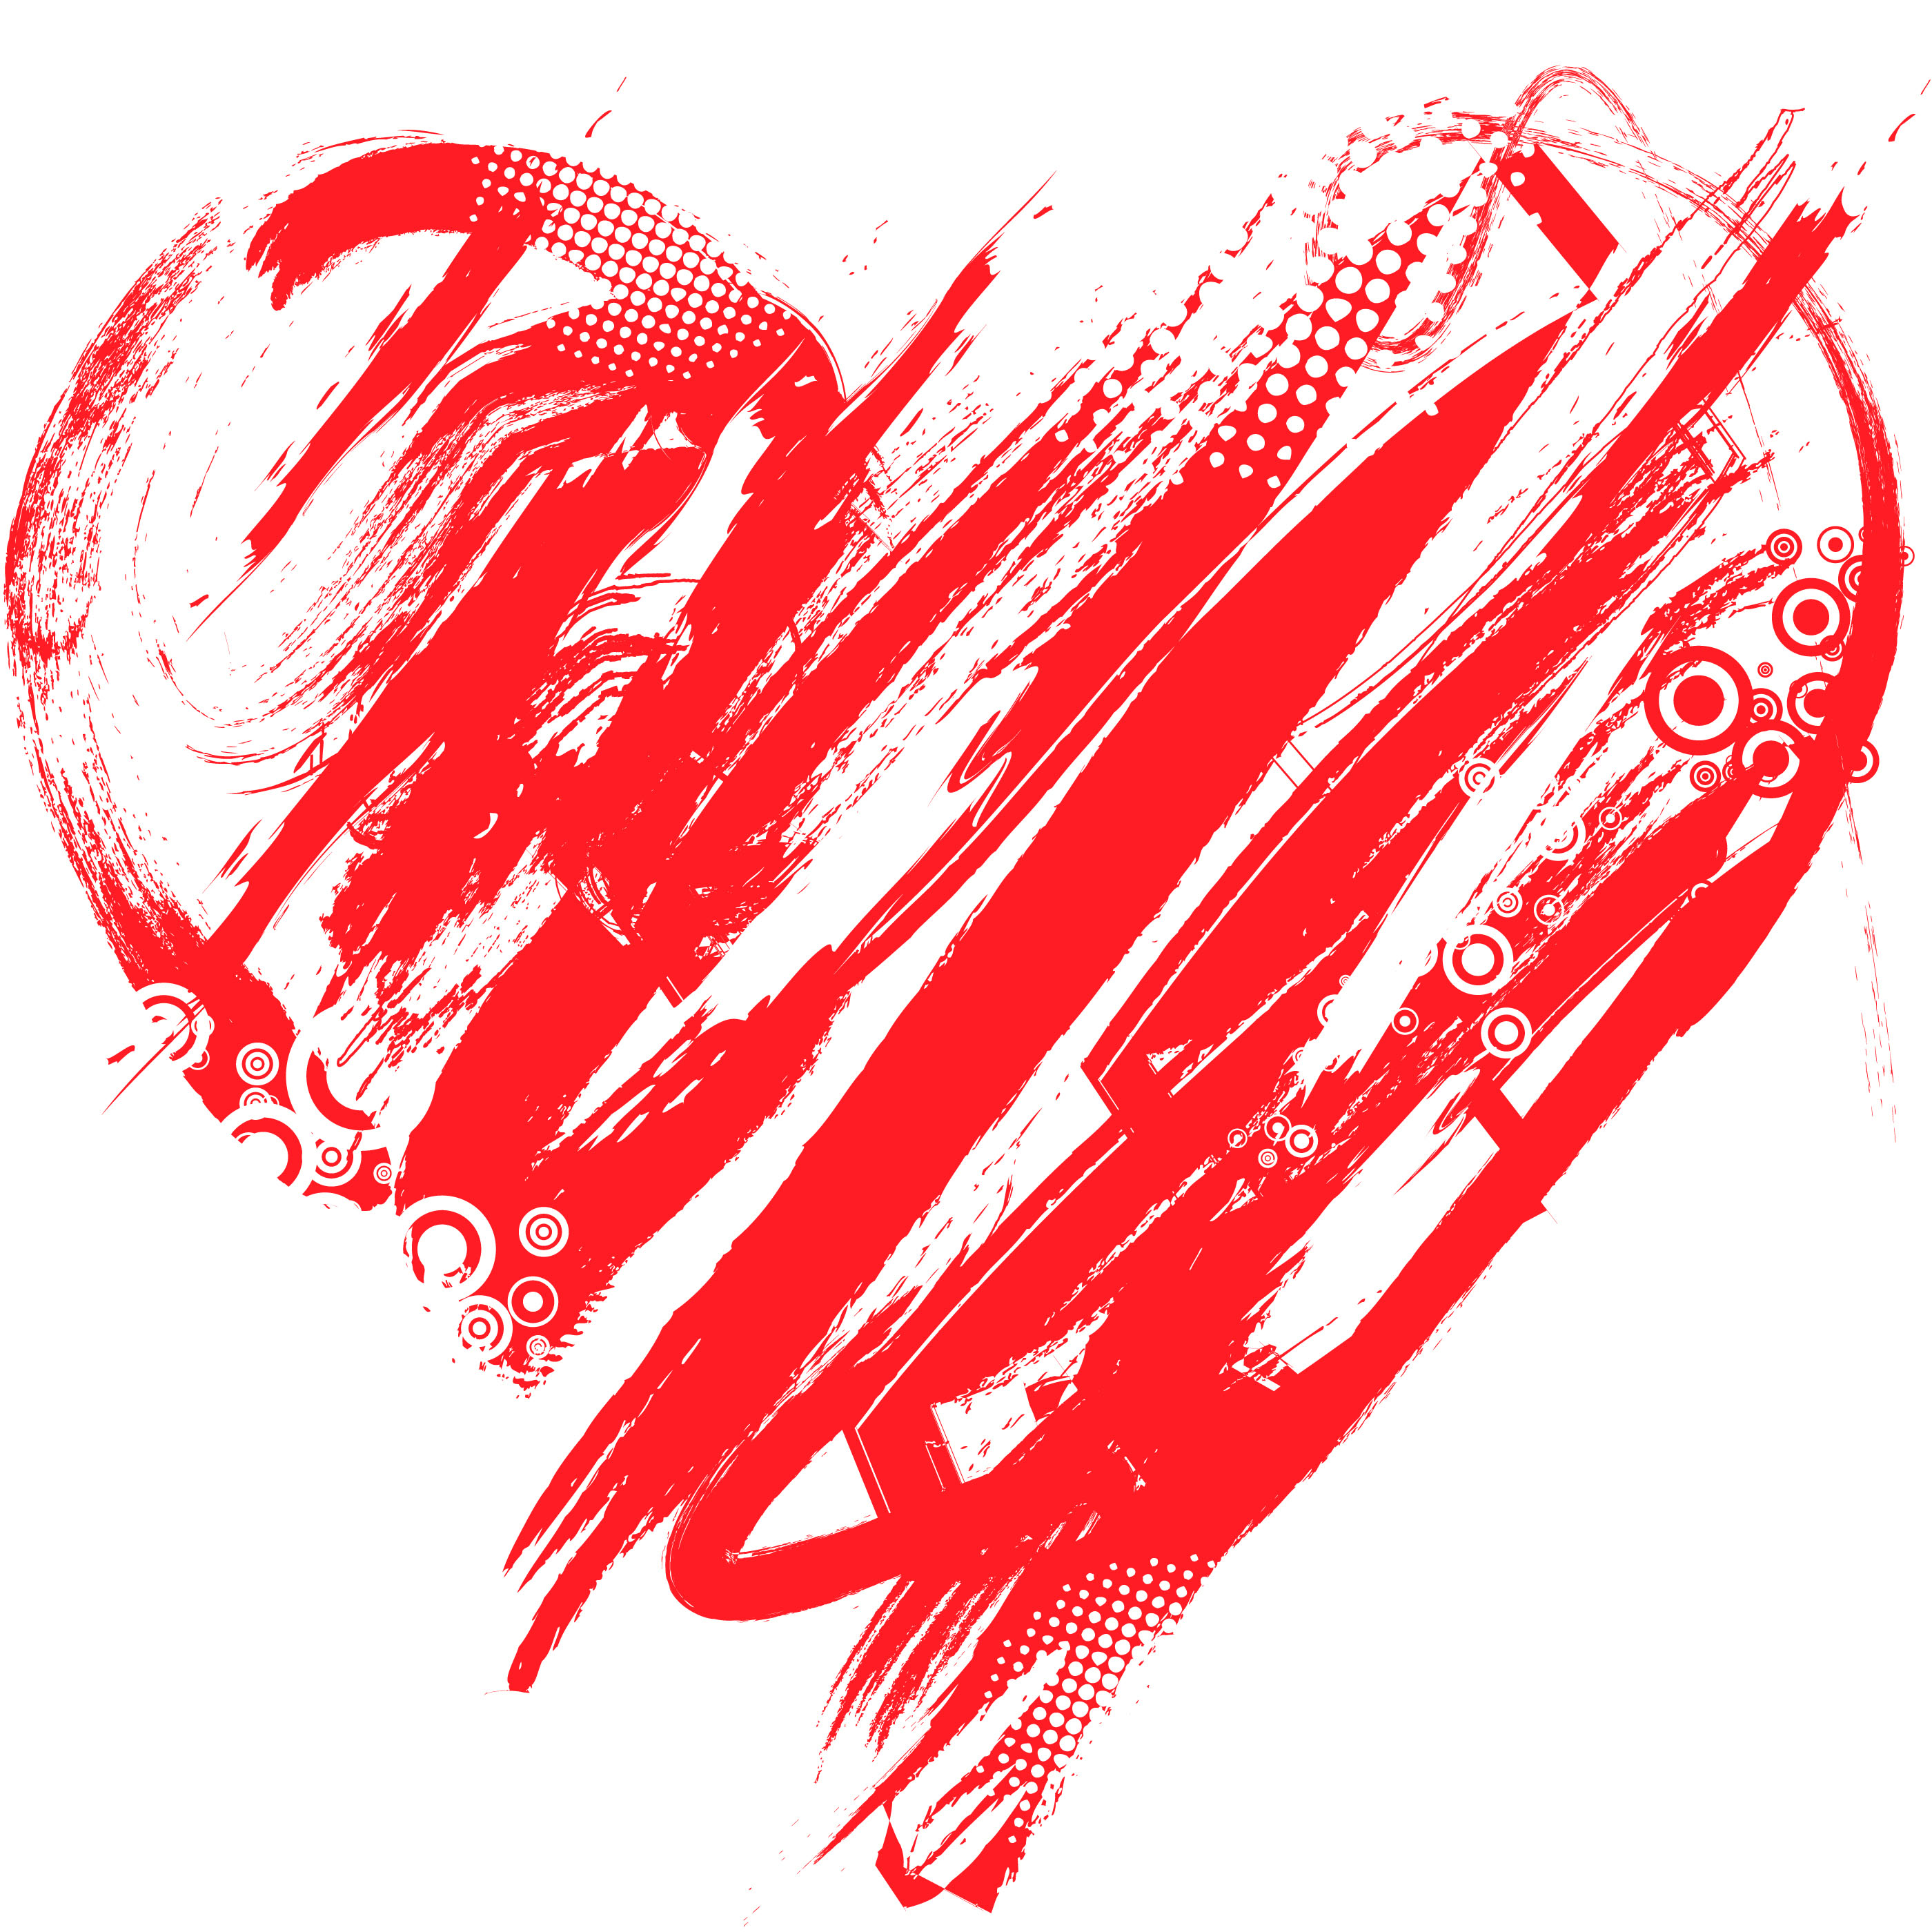 valentines day heart modern art image wallpaper encore executive